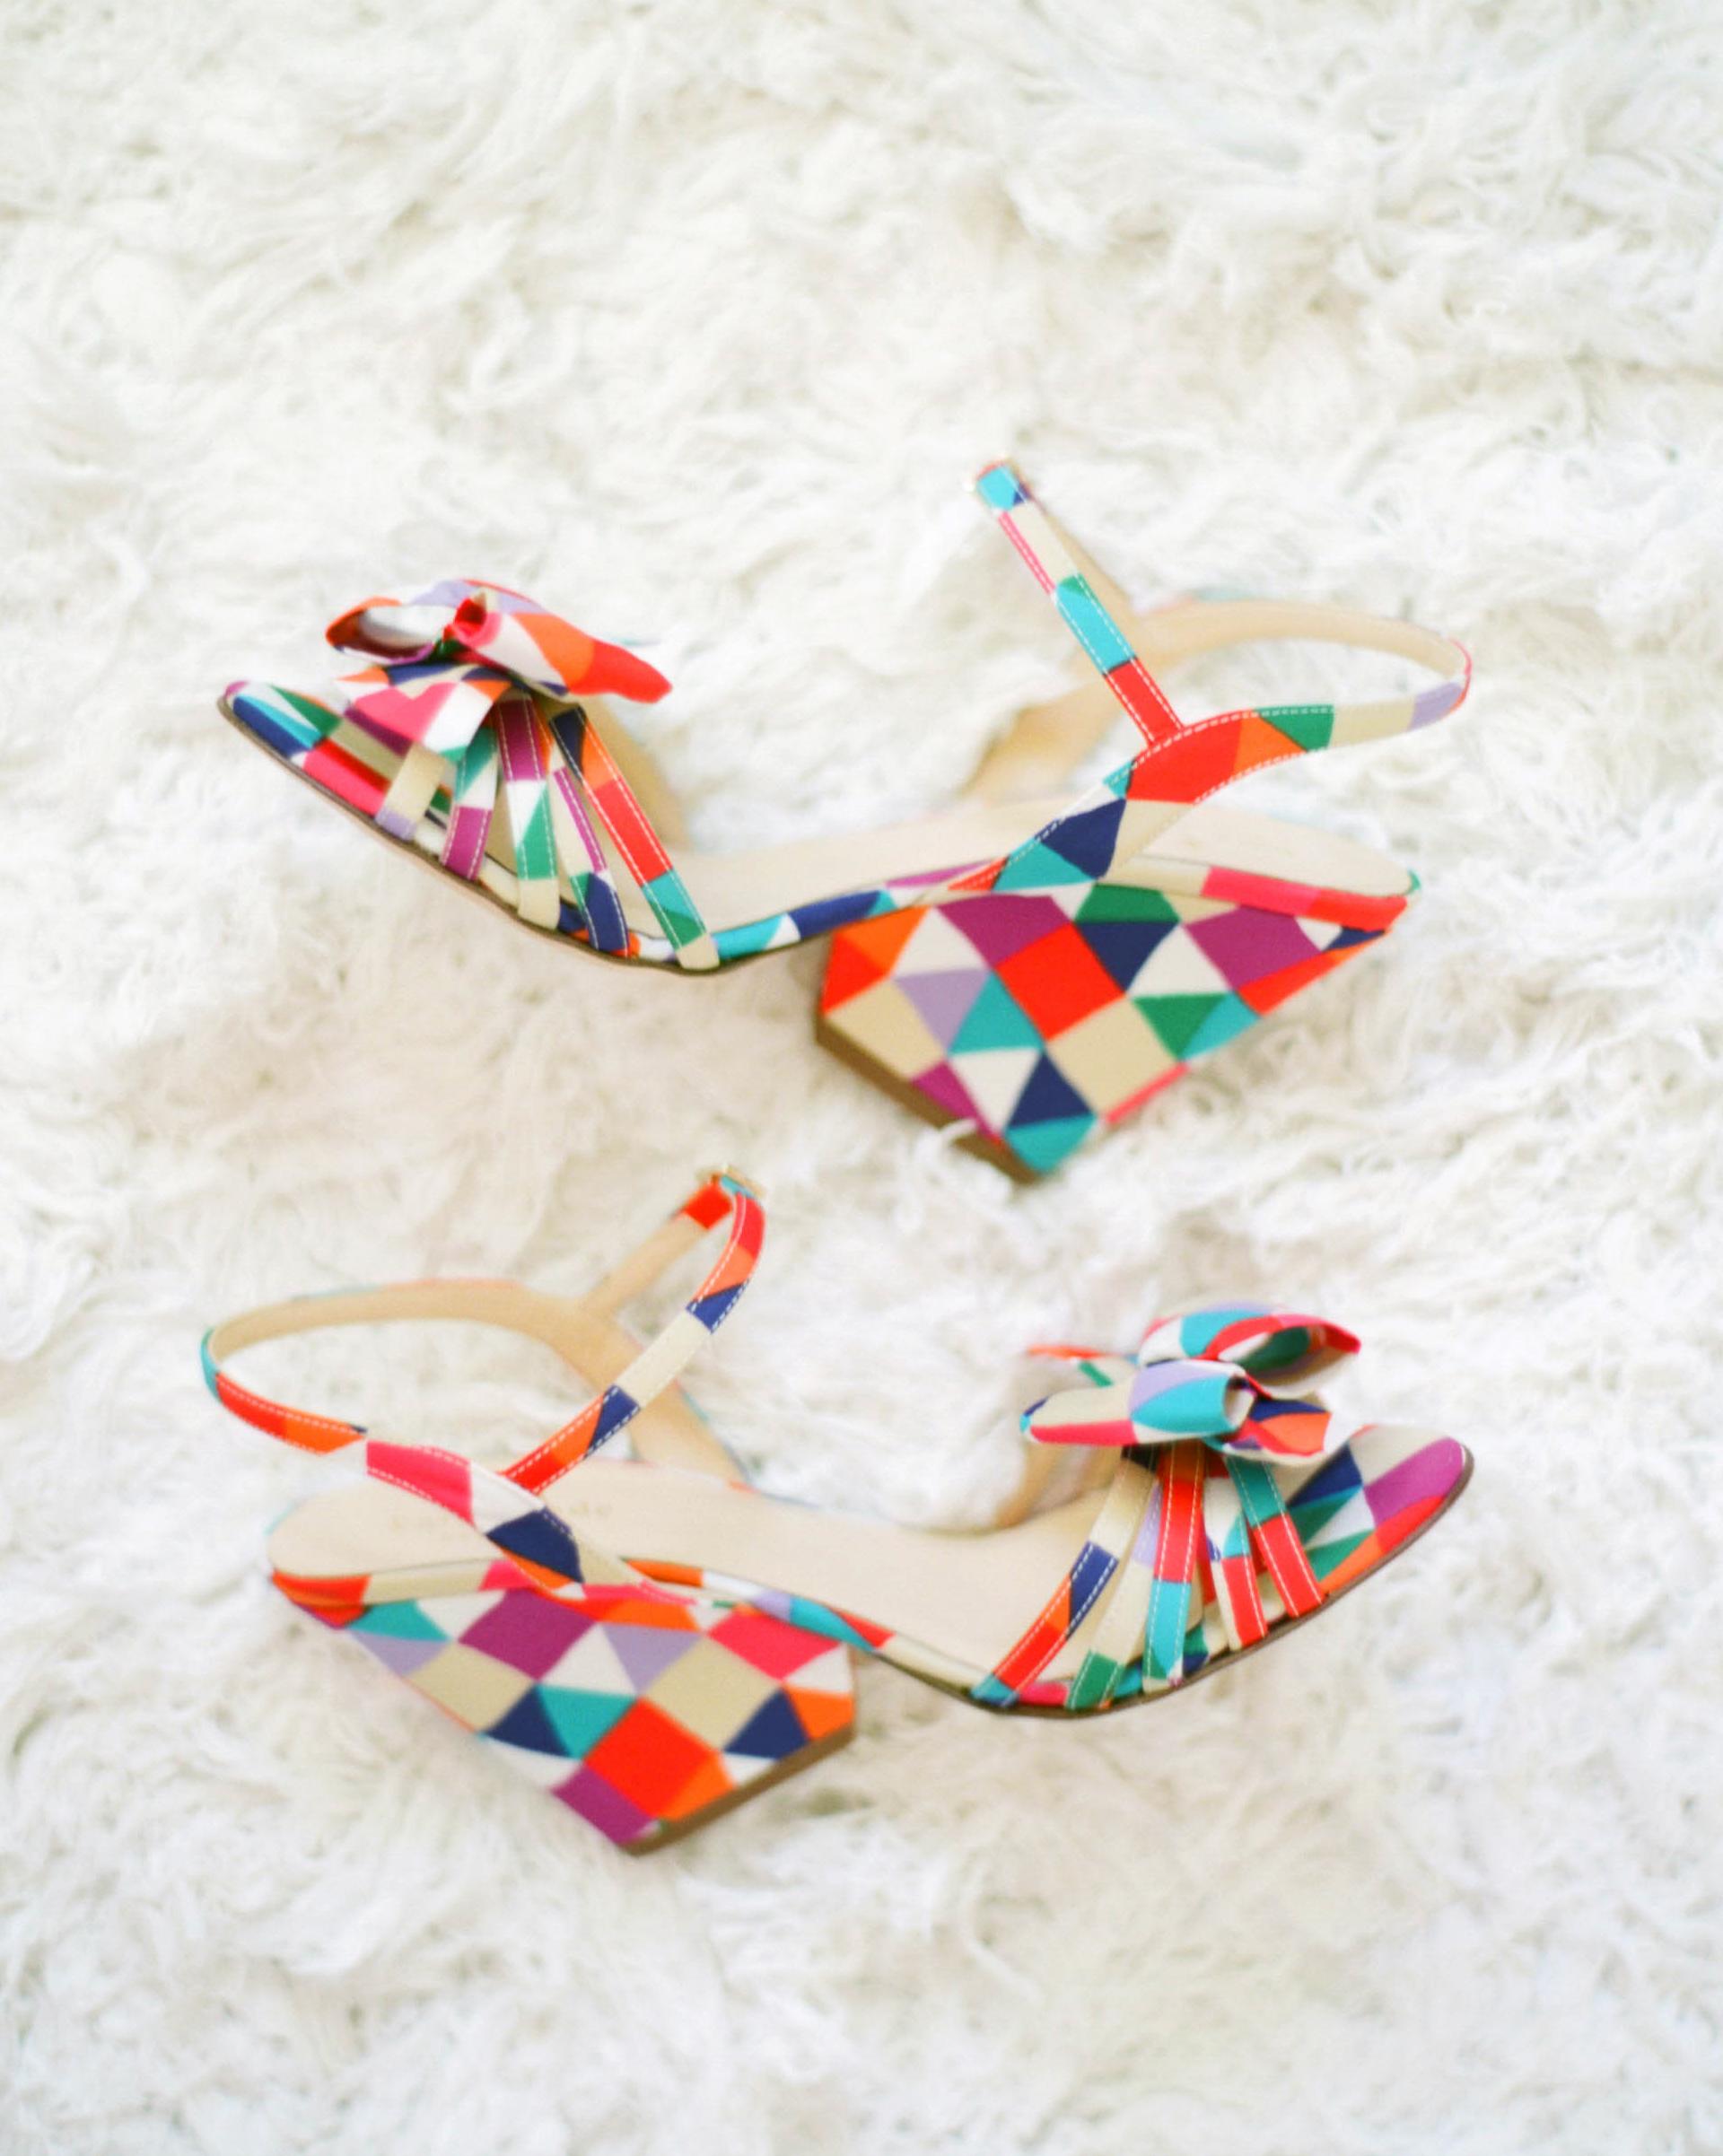 liz-jeff-wedding-shoes-025-s112303-1115.jpg